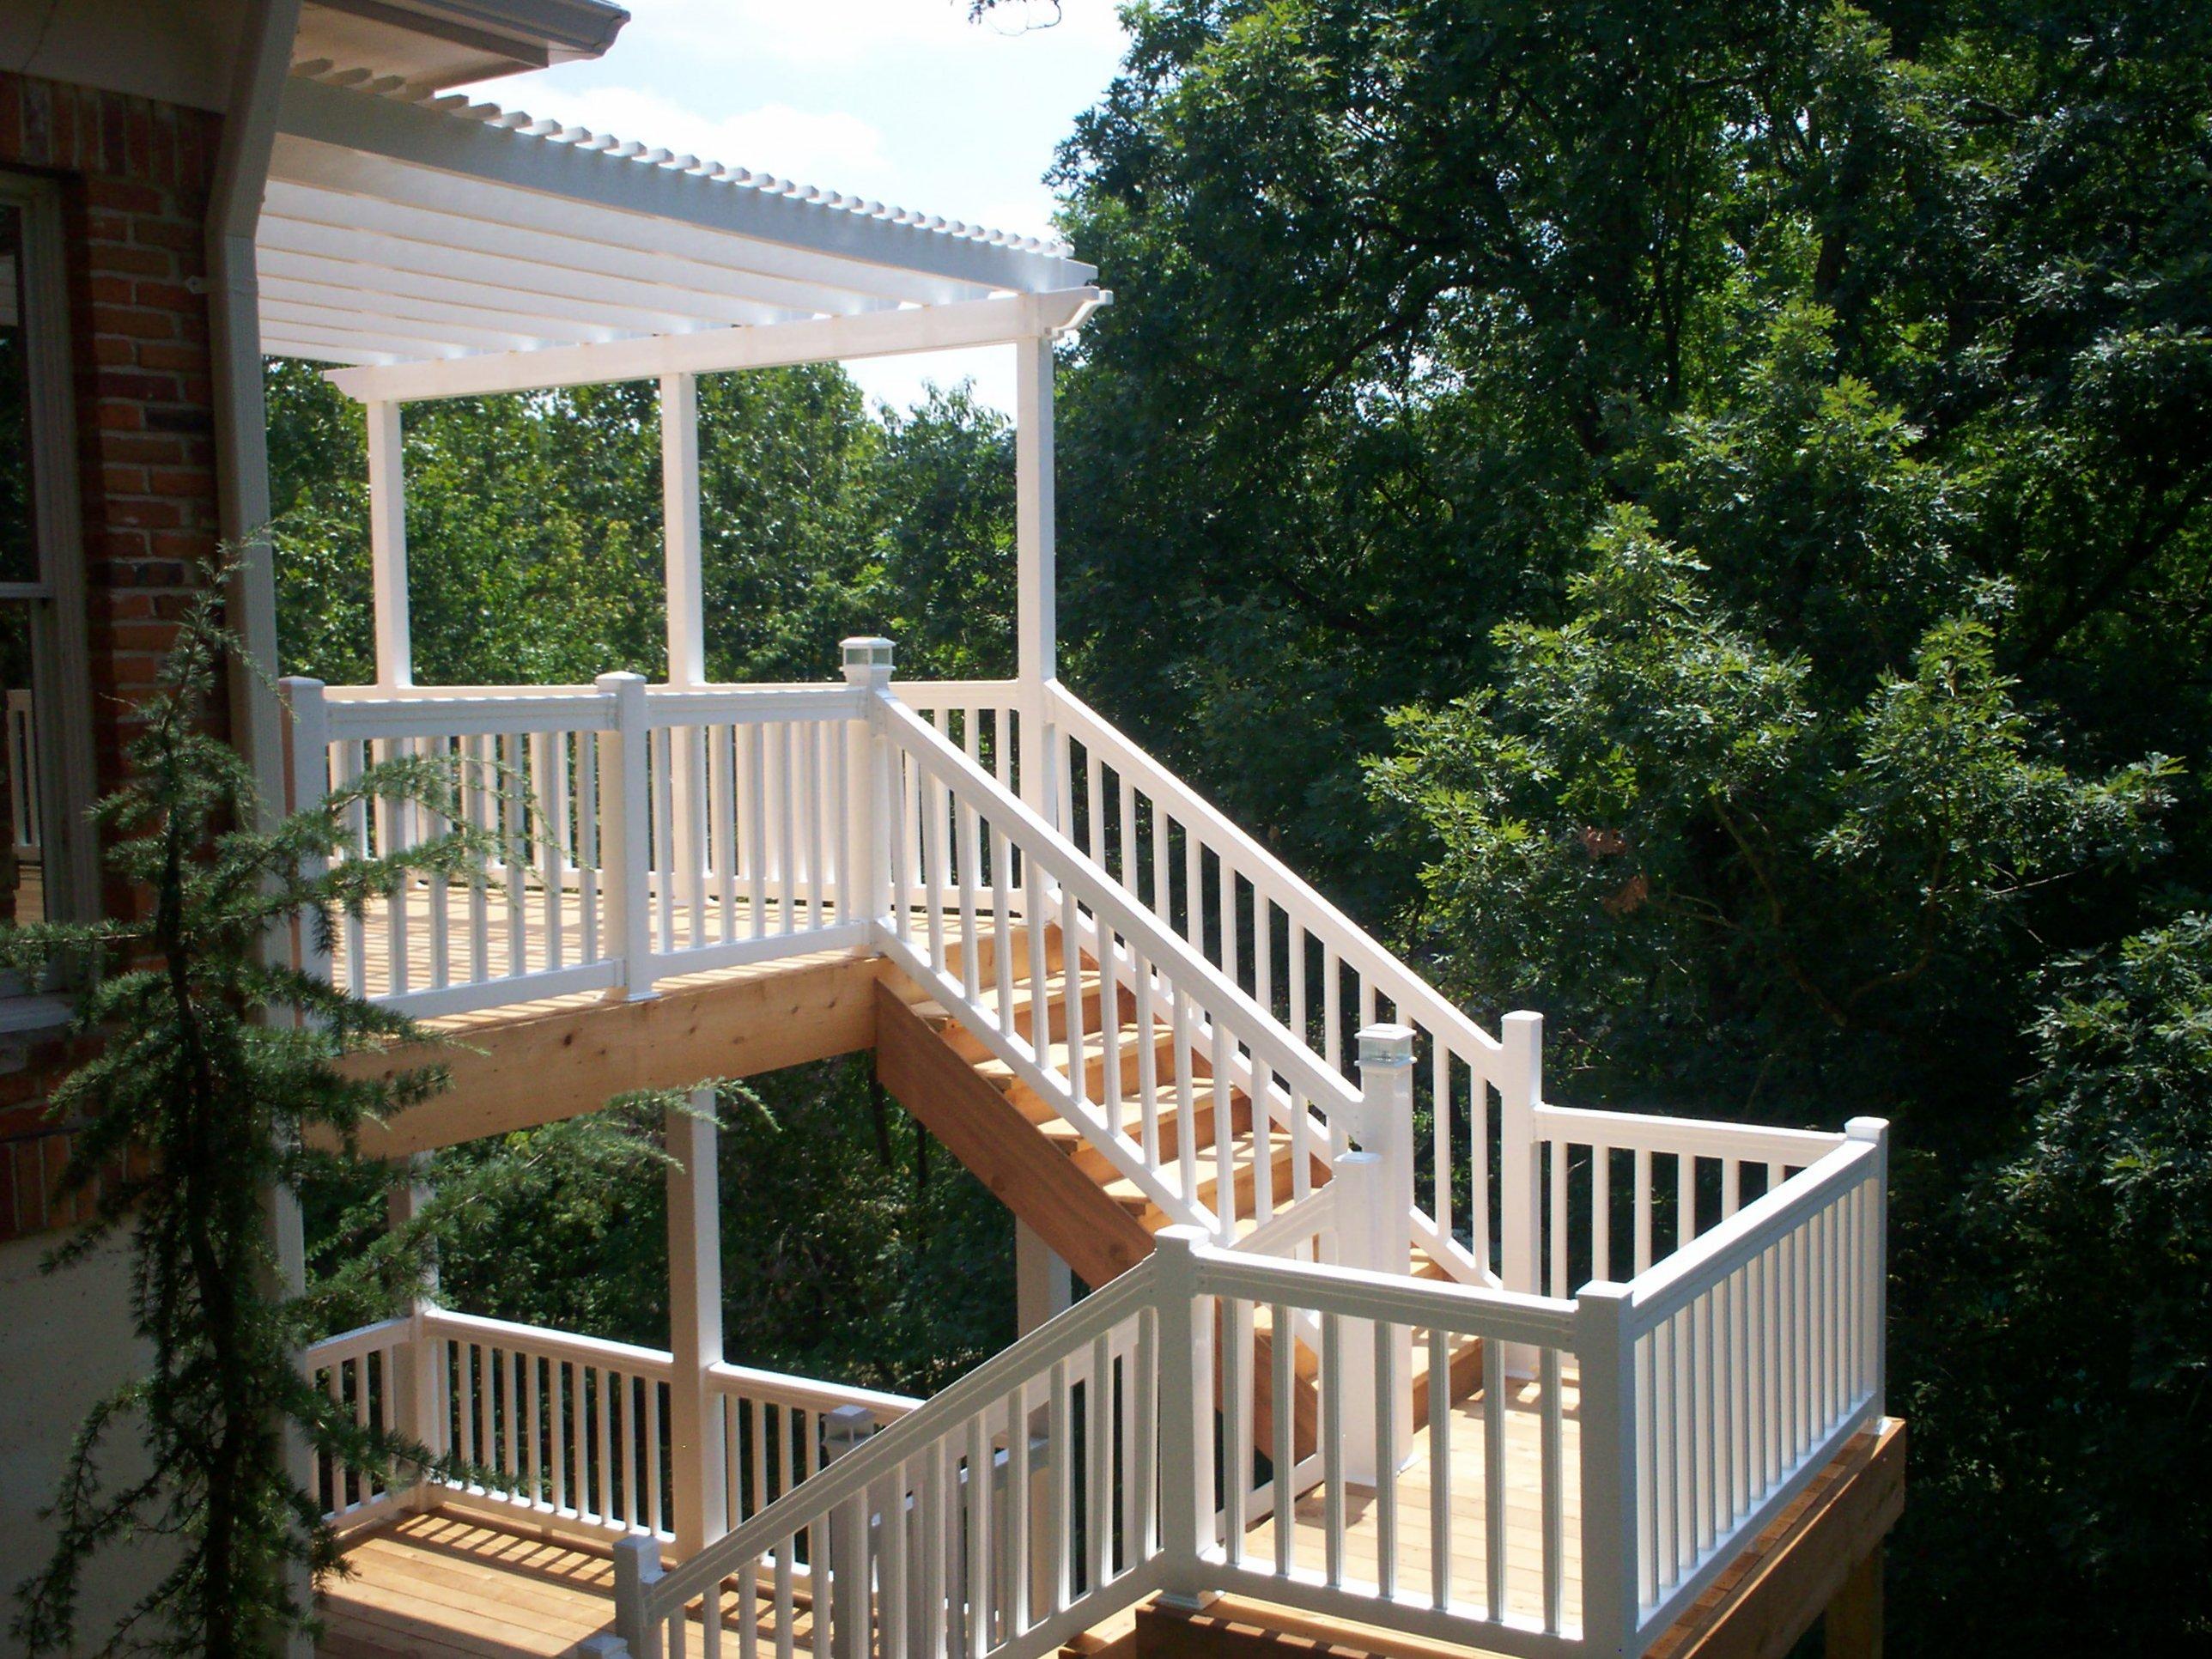 PDF DIY Cedar Arbor Bench Plans Download carport designs nsw » woodworktips